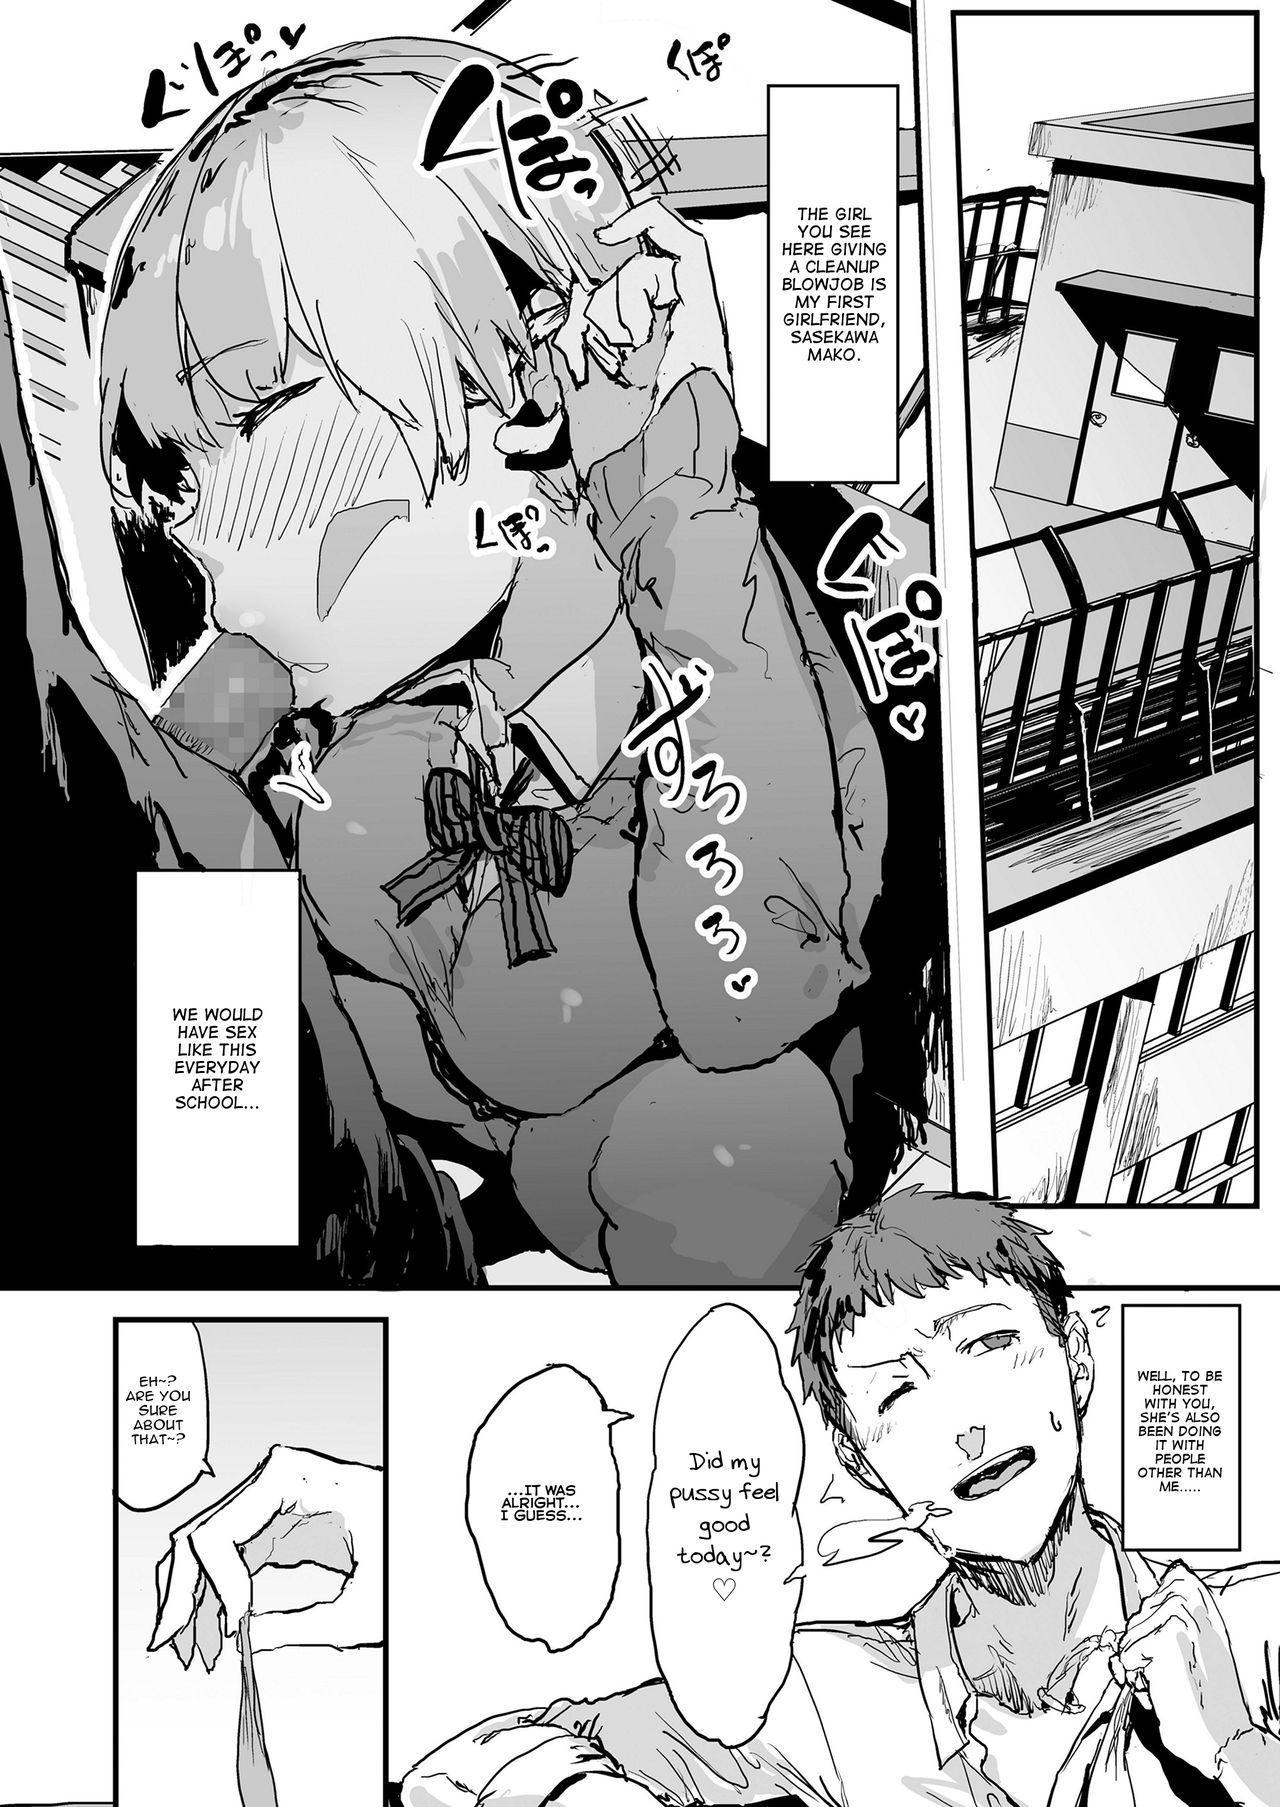 [Oosawara Sadao] Ore no Kanojo wa Hamedori JK ~Koukai Bokki o Soete~ (COMIC Koh 2018-06) | My Girlfriend is a Sex Taping JK ~Complete With A Regretful Boner~ [English] [Nisor] [Digital] 1